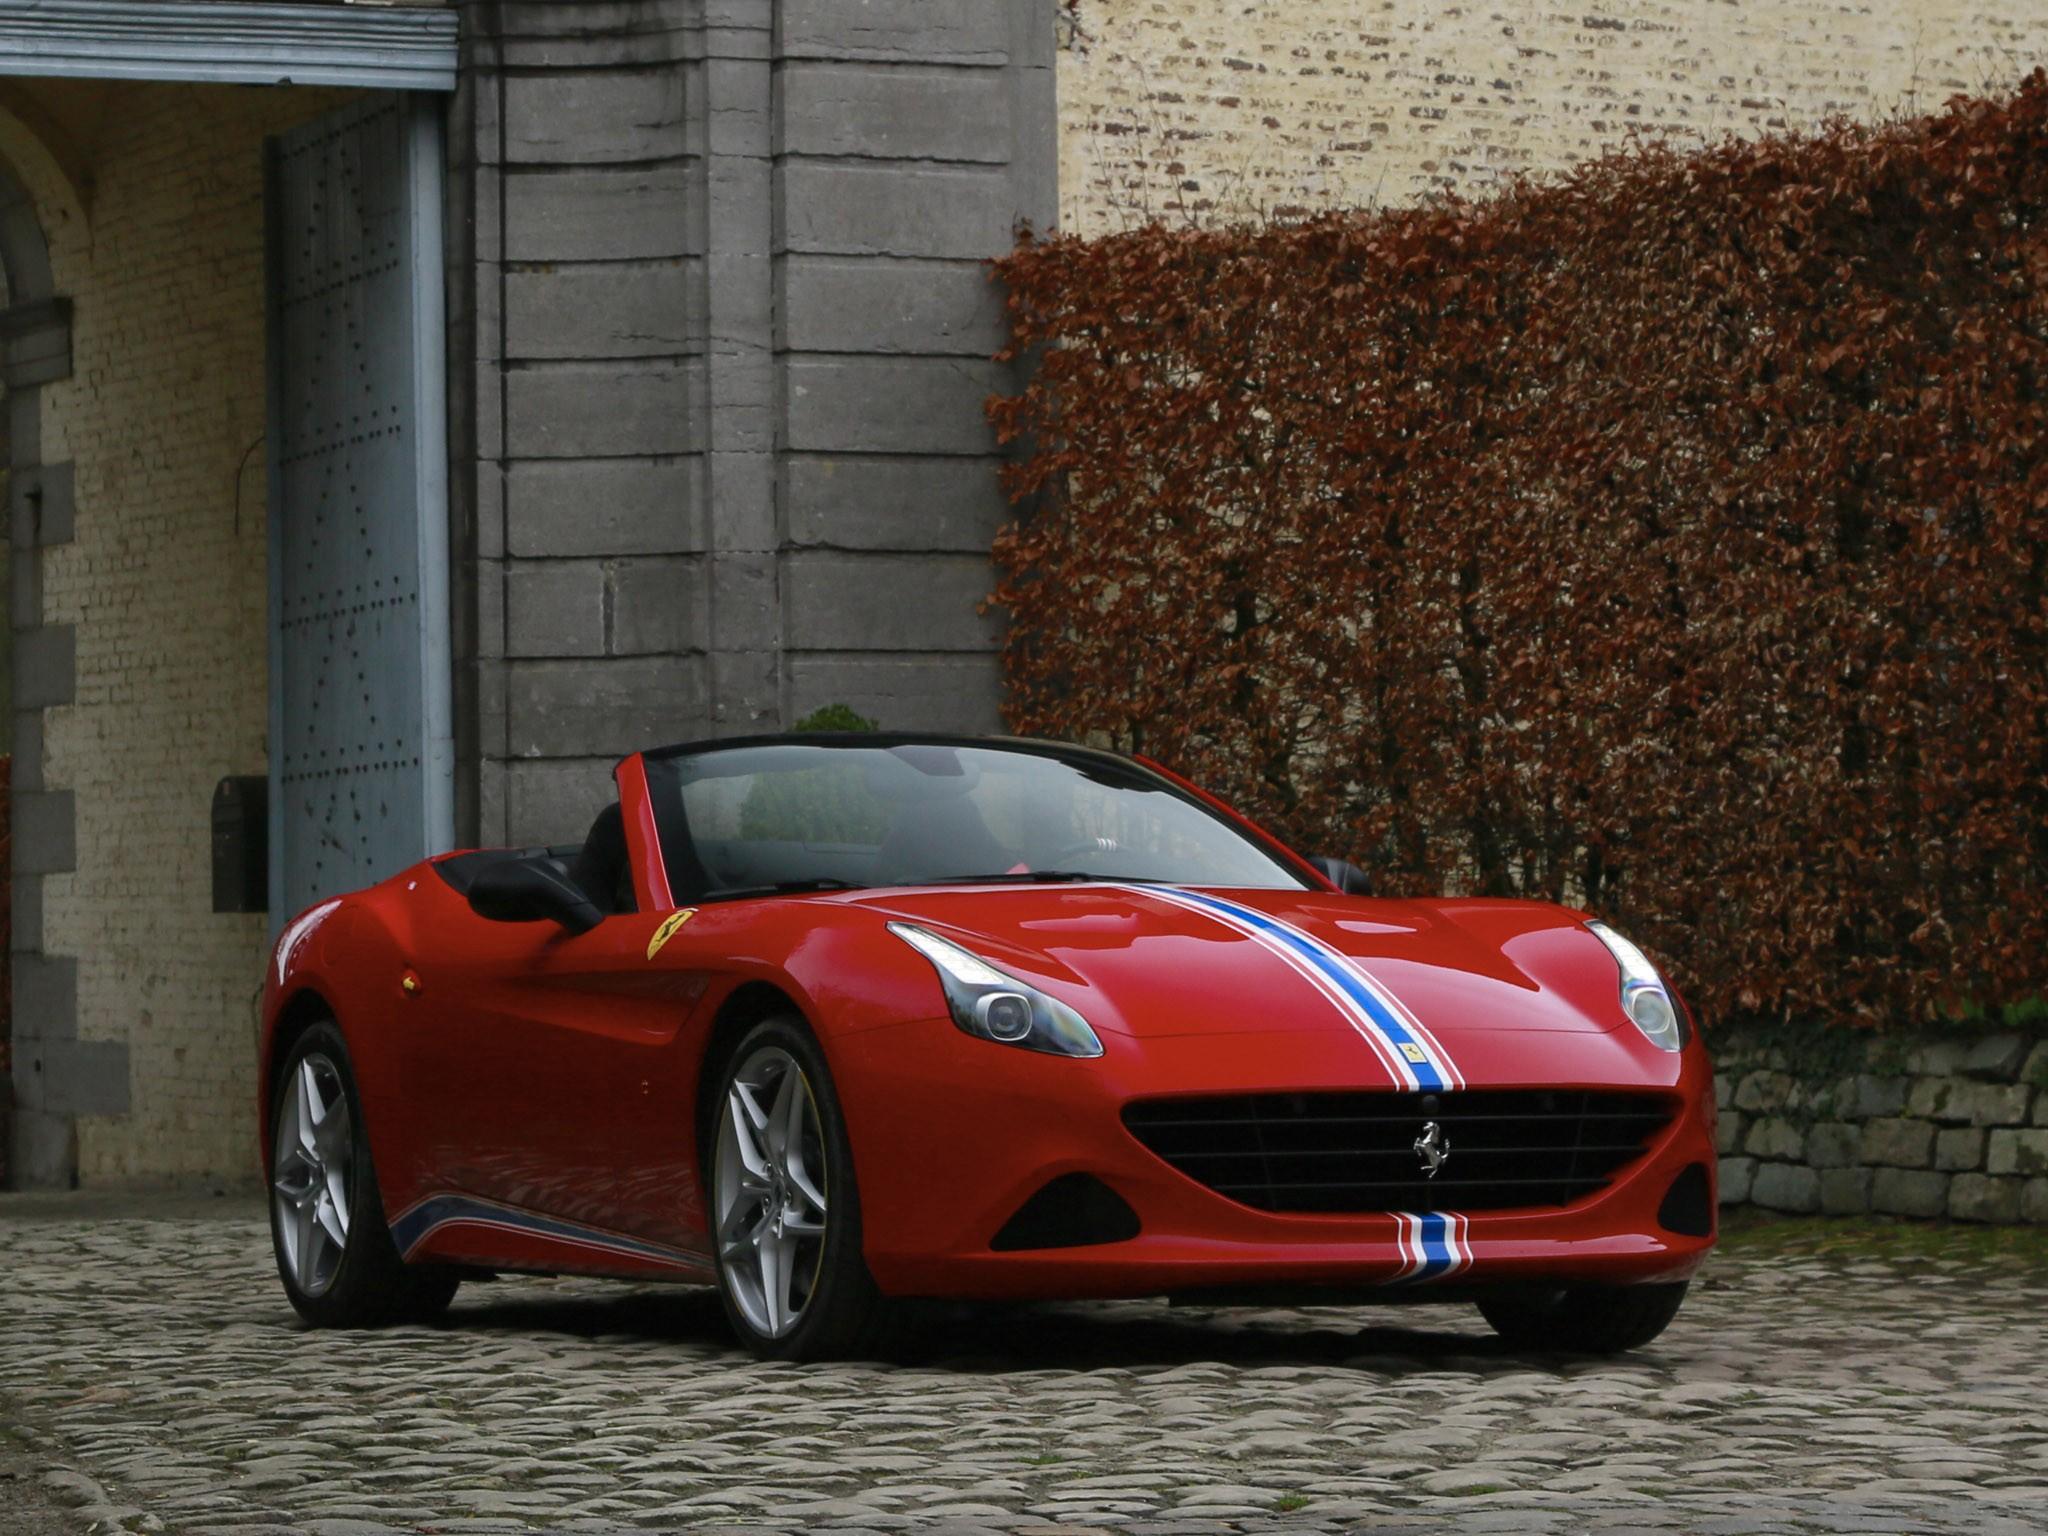 2016 Ferrari California T - Tailor Made - 24 Heures Spa